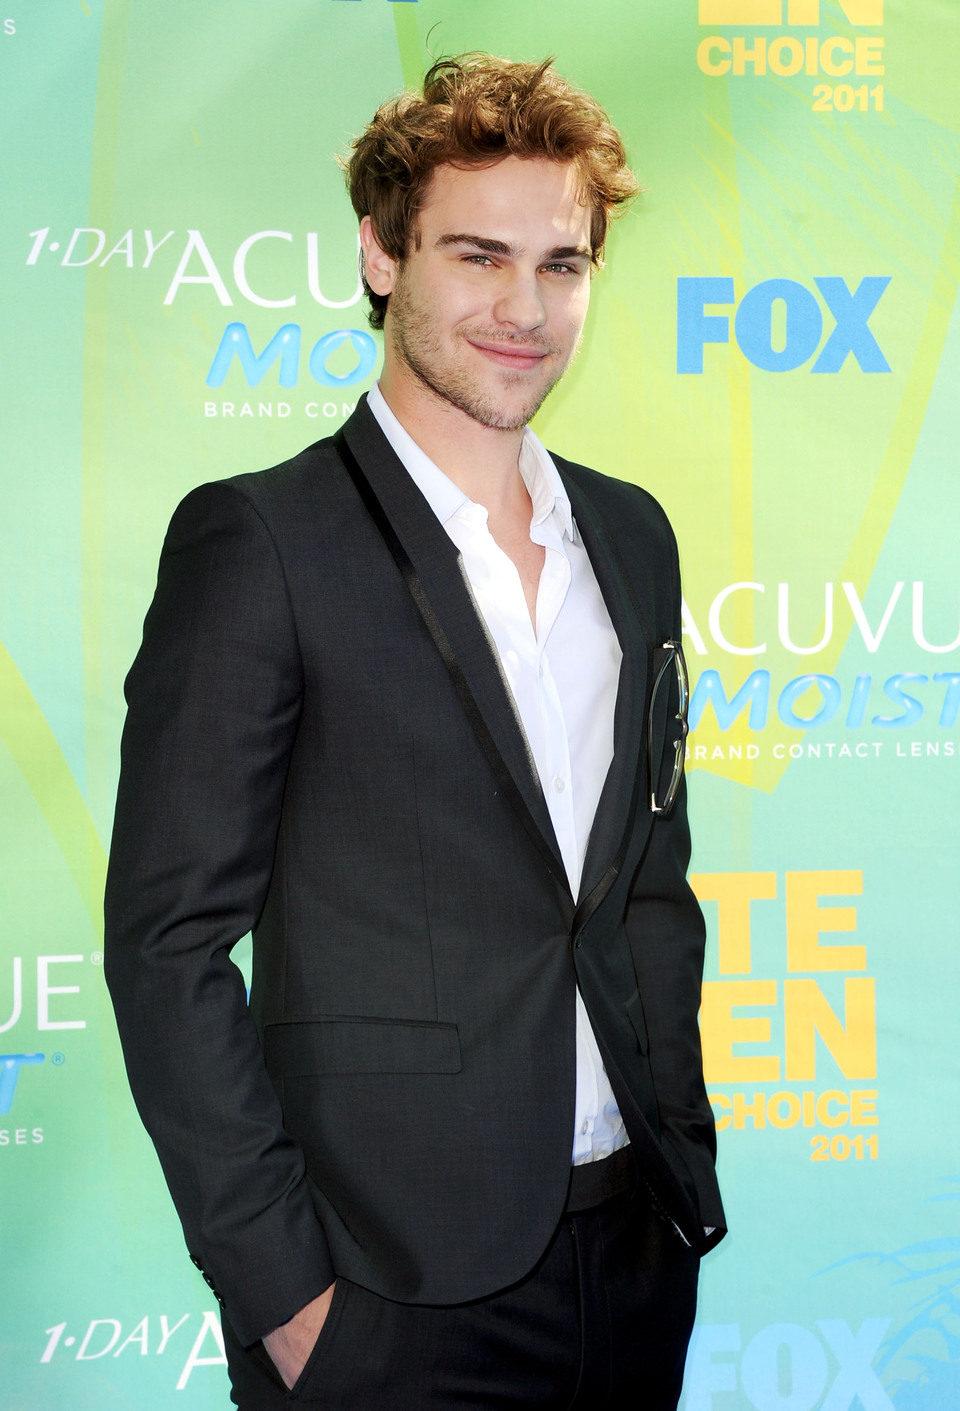 Grey Damon en el photocall de los Teen Choice Awards 2011